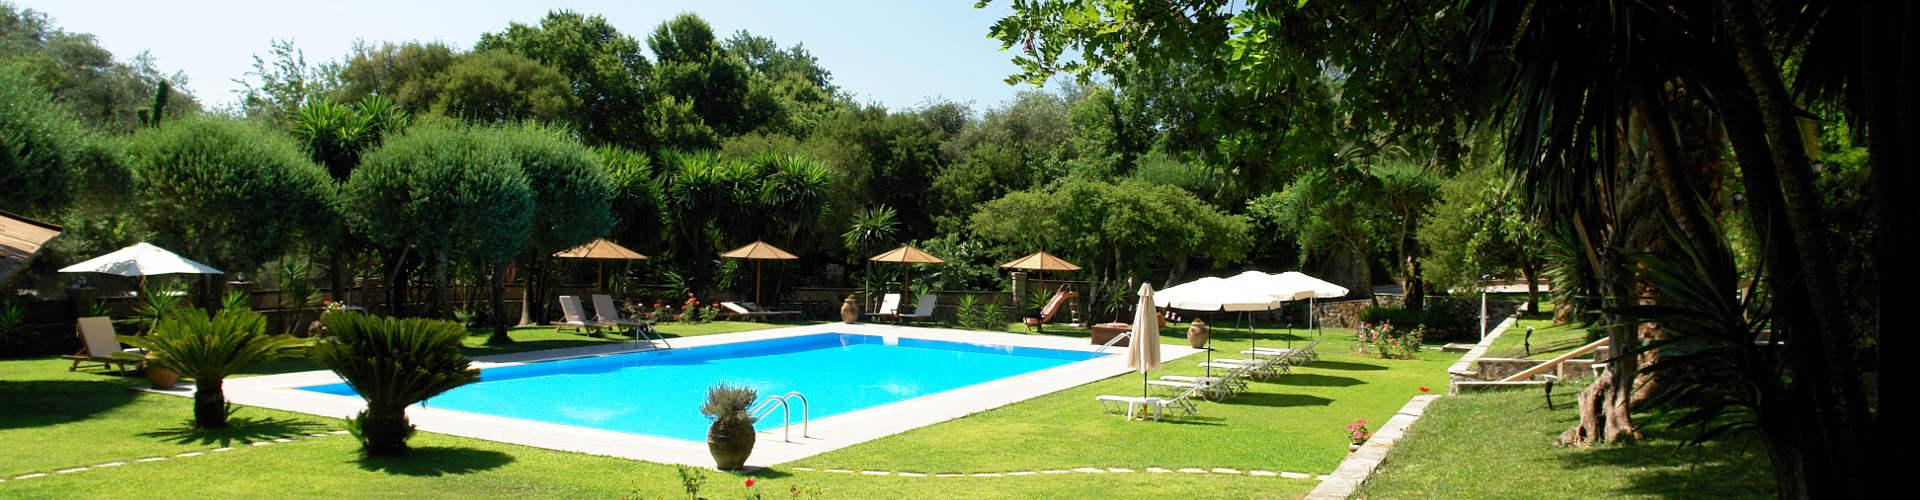 Fiori Hotel.How To Get To Fiori Hotel Corfu